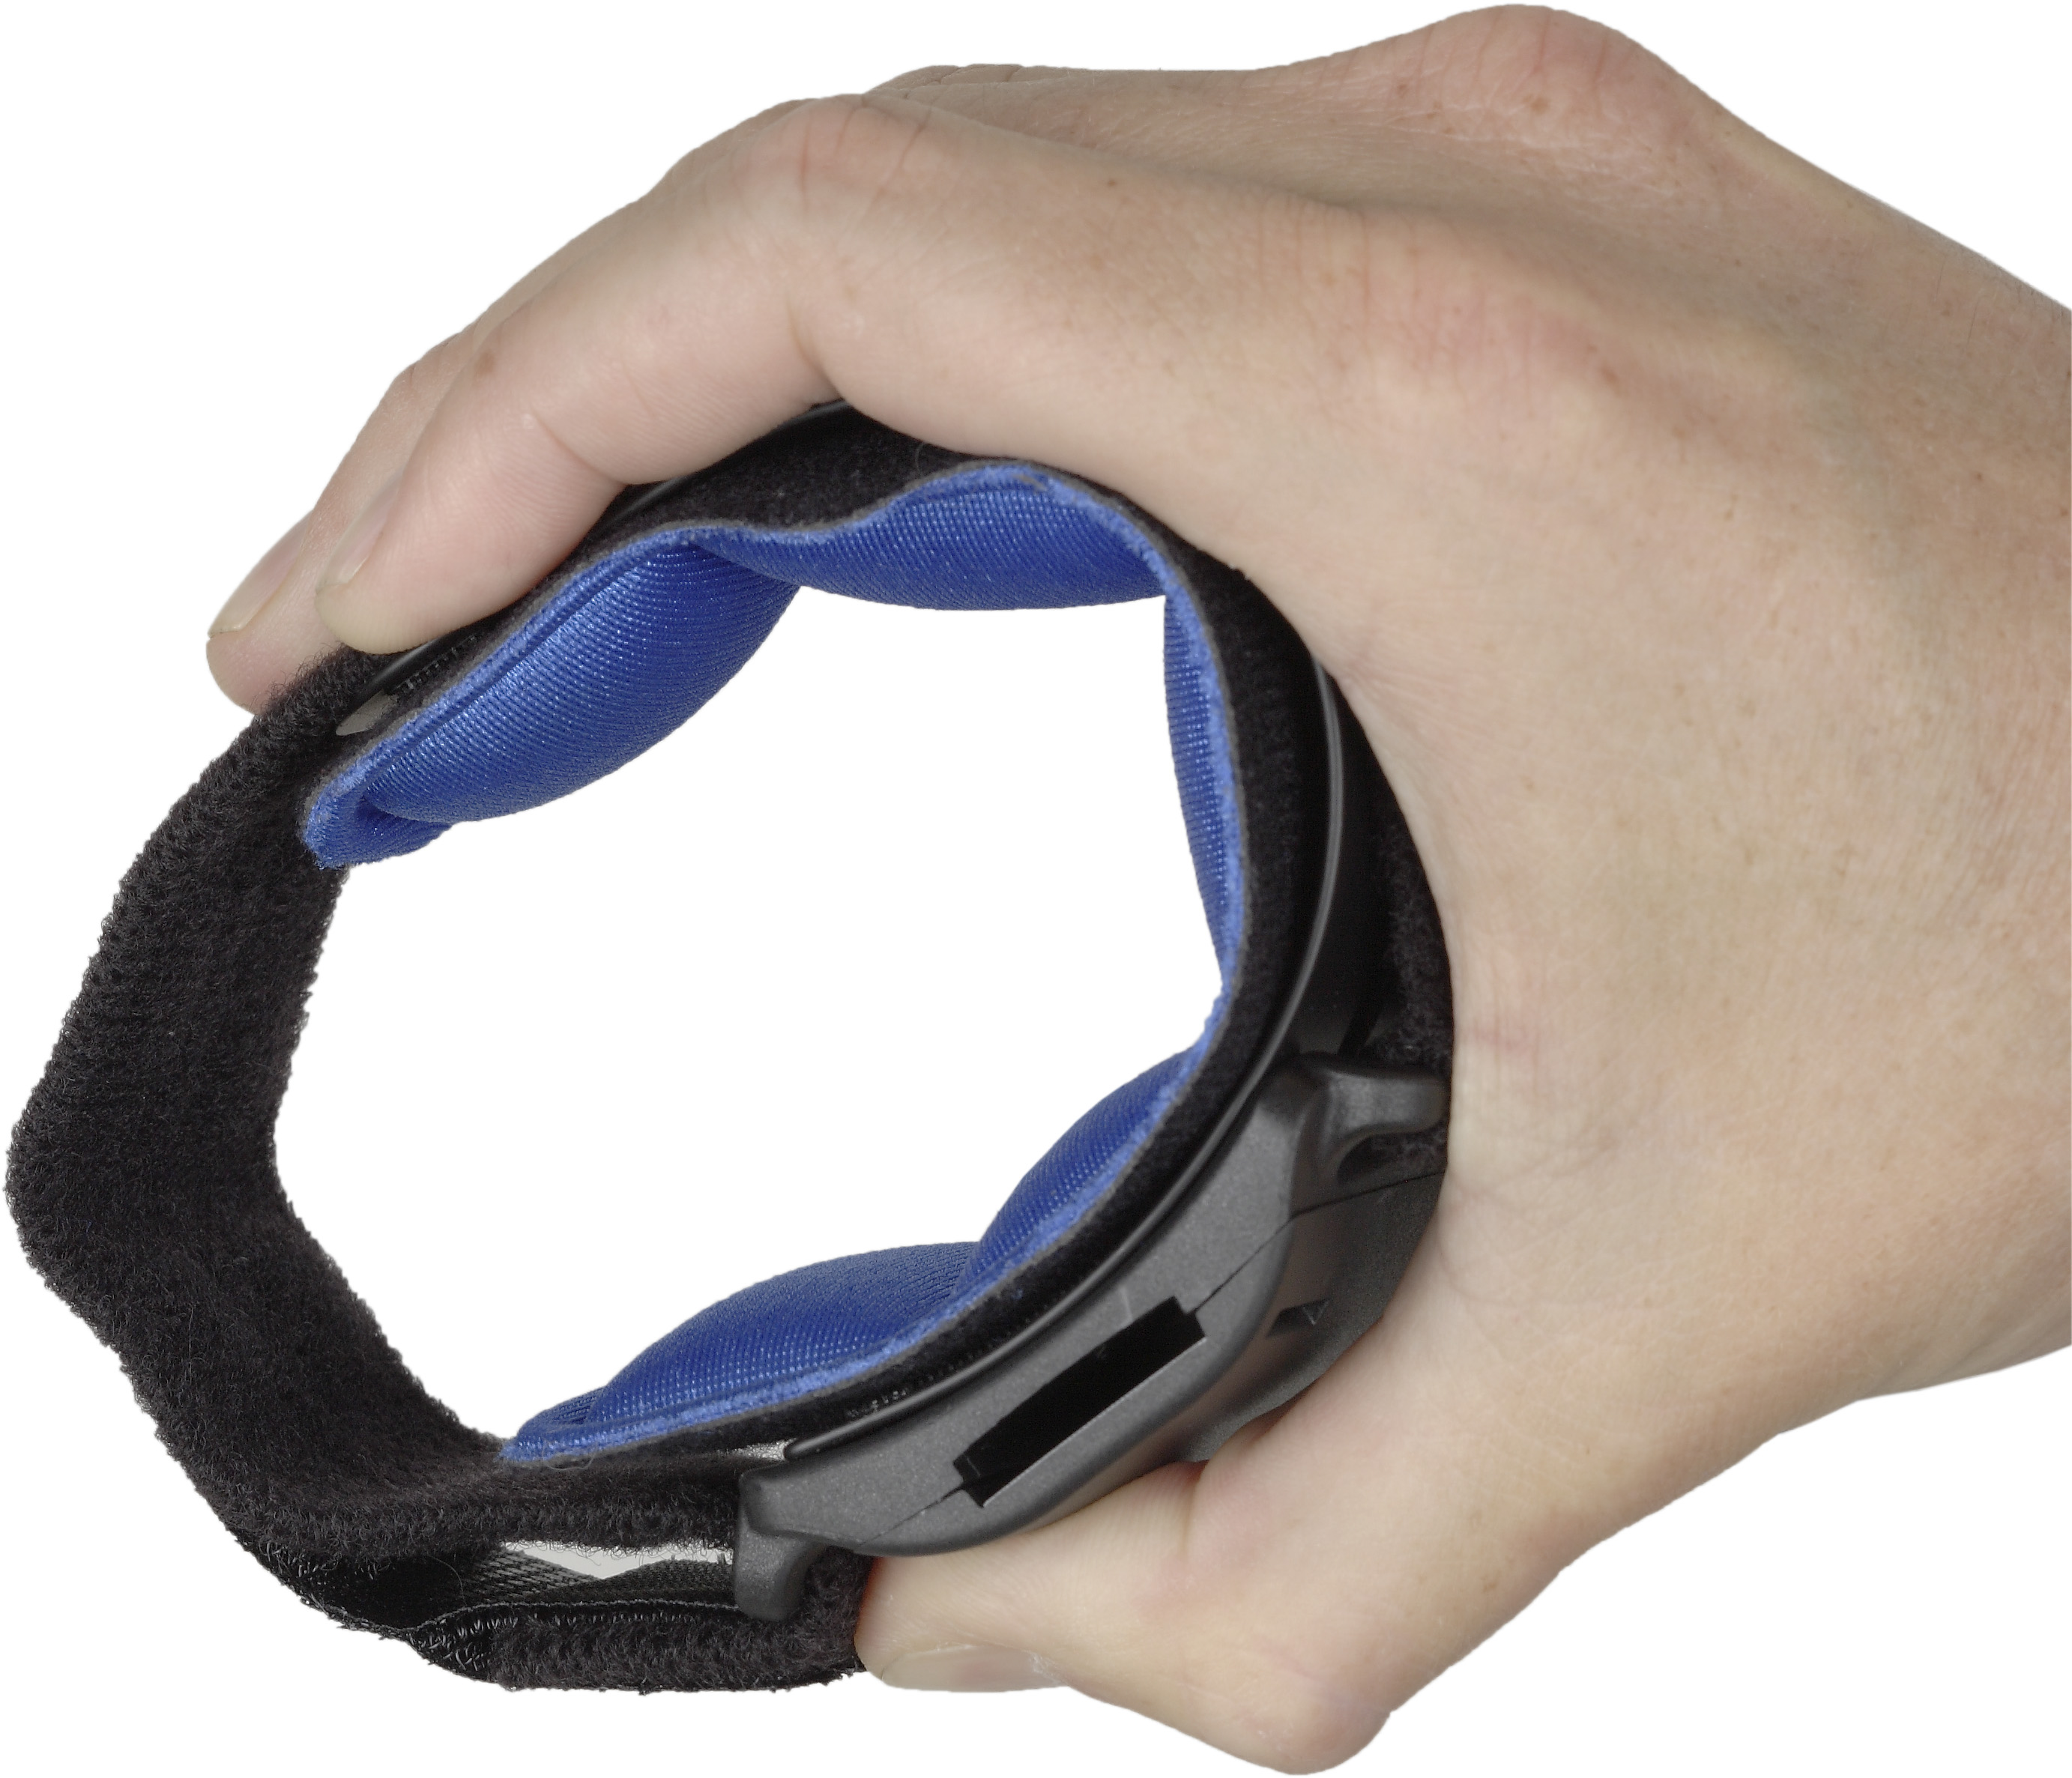 Innovator X Post Op Elbow Brace_Cuff.jpg